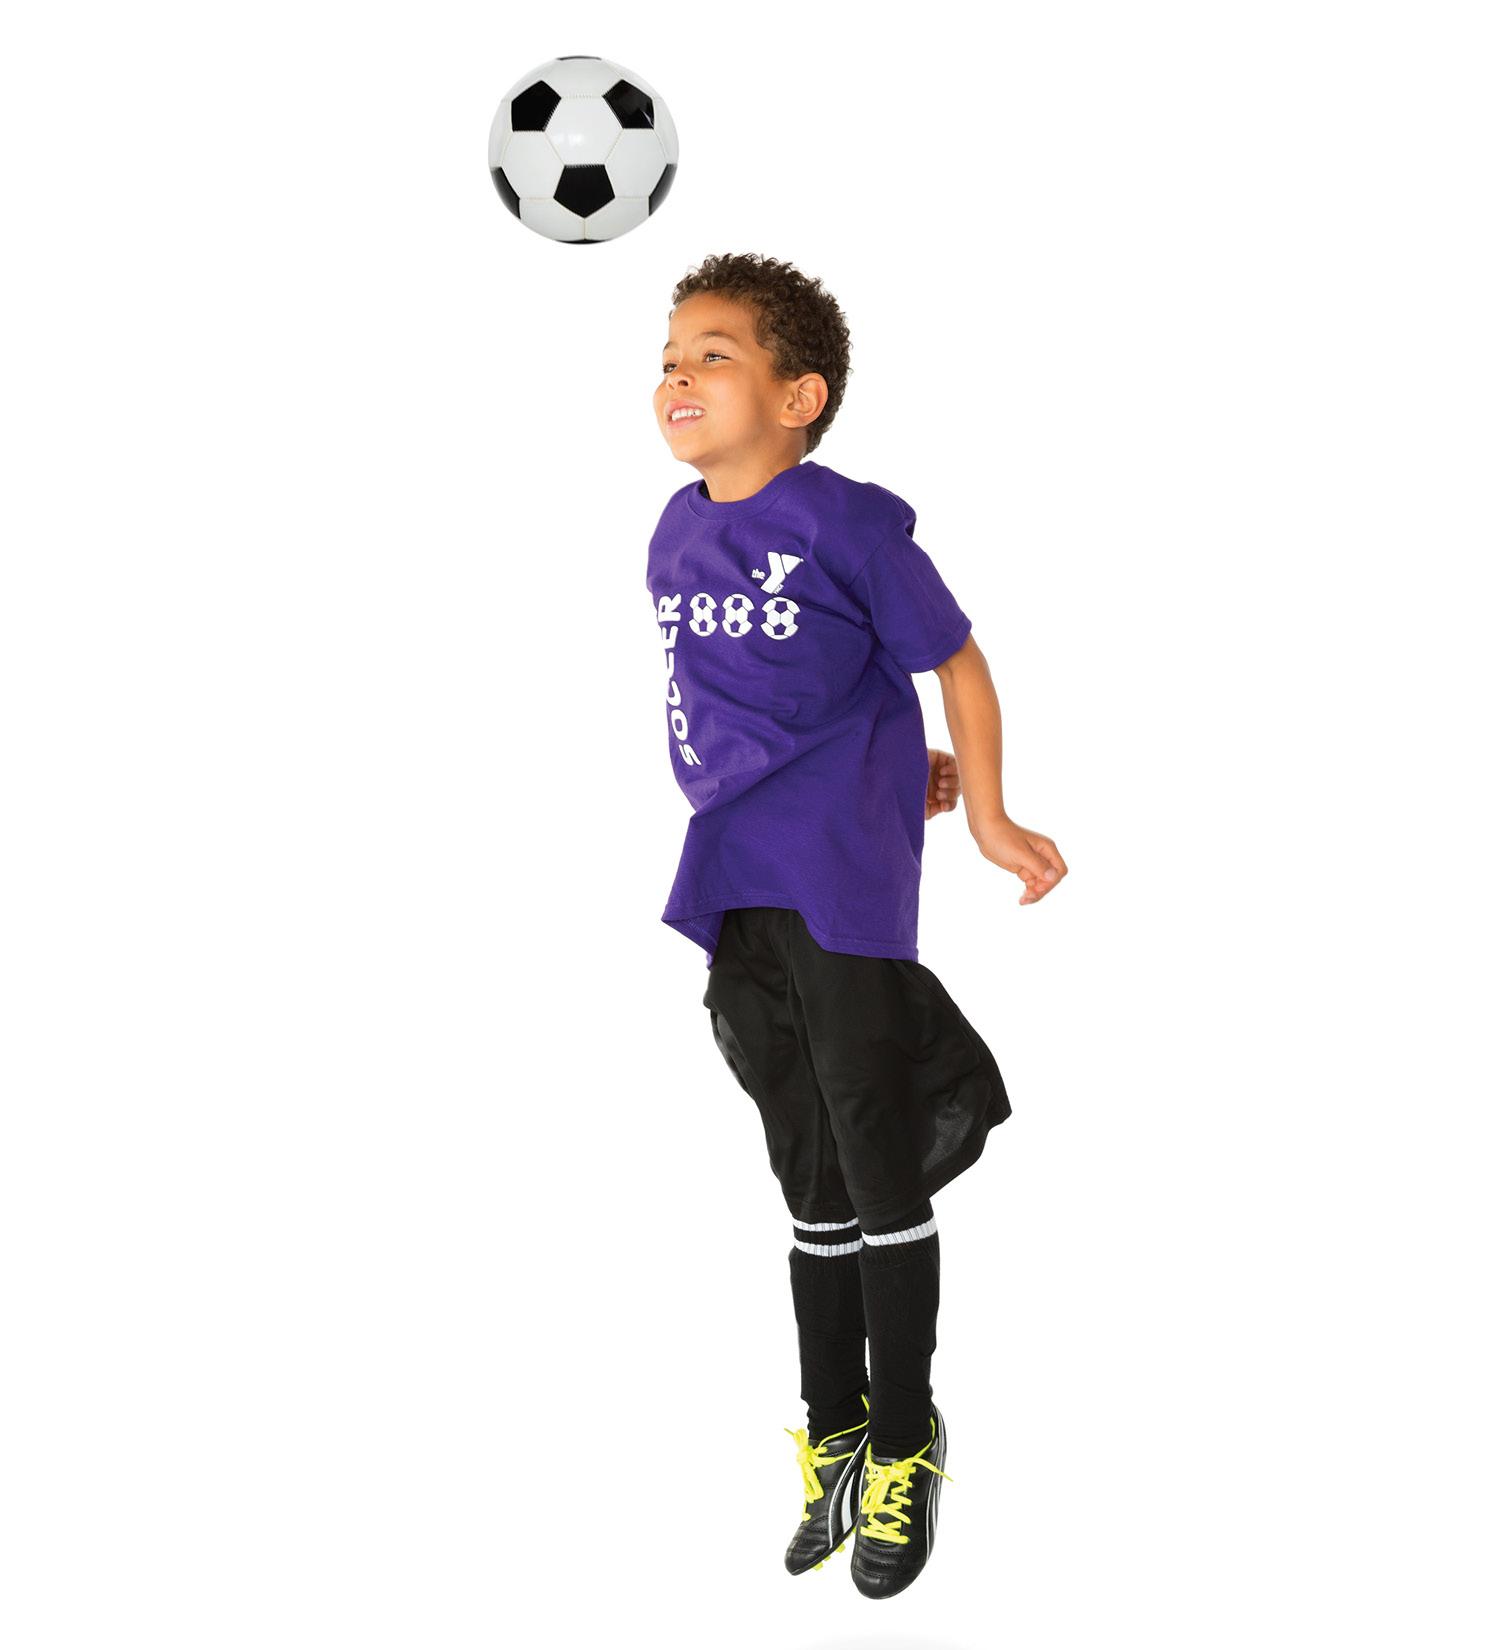 Youth Sports Ymca